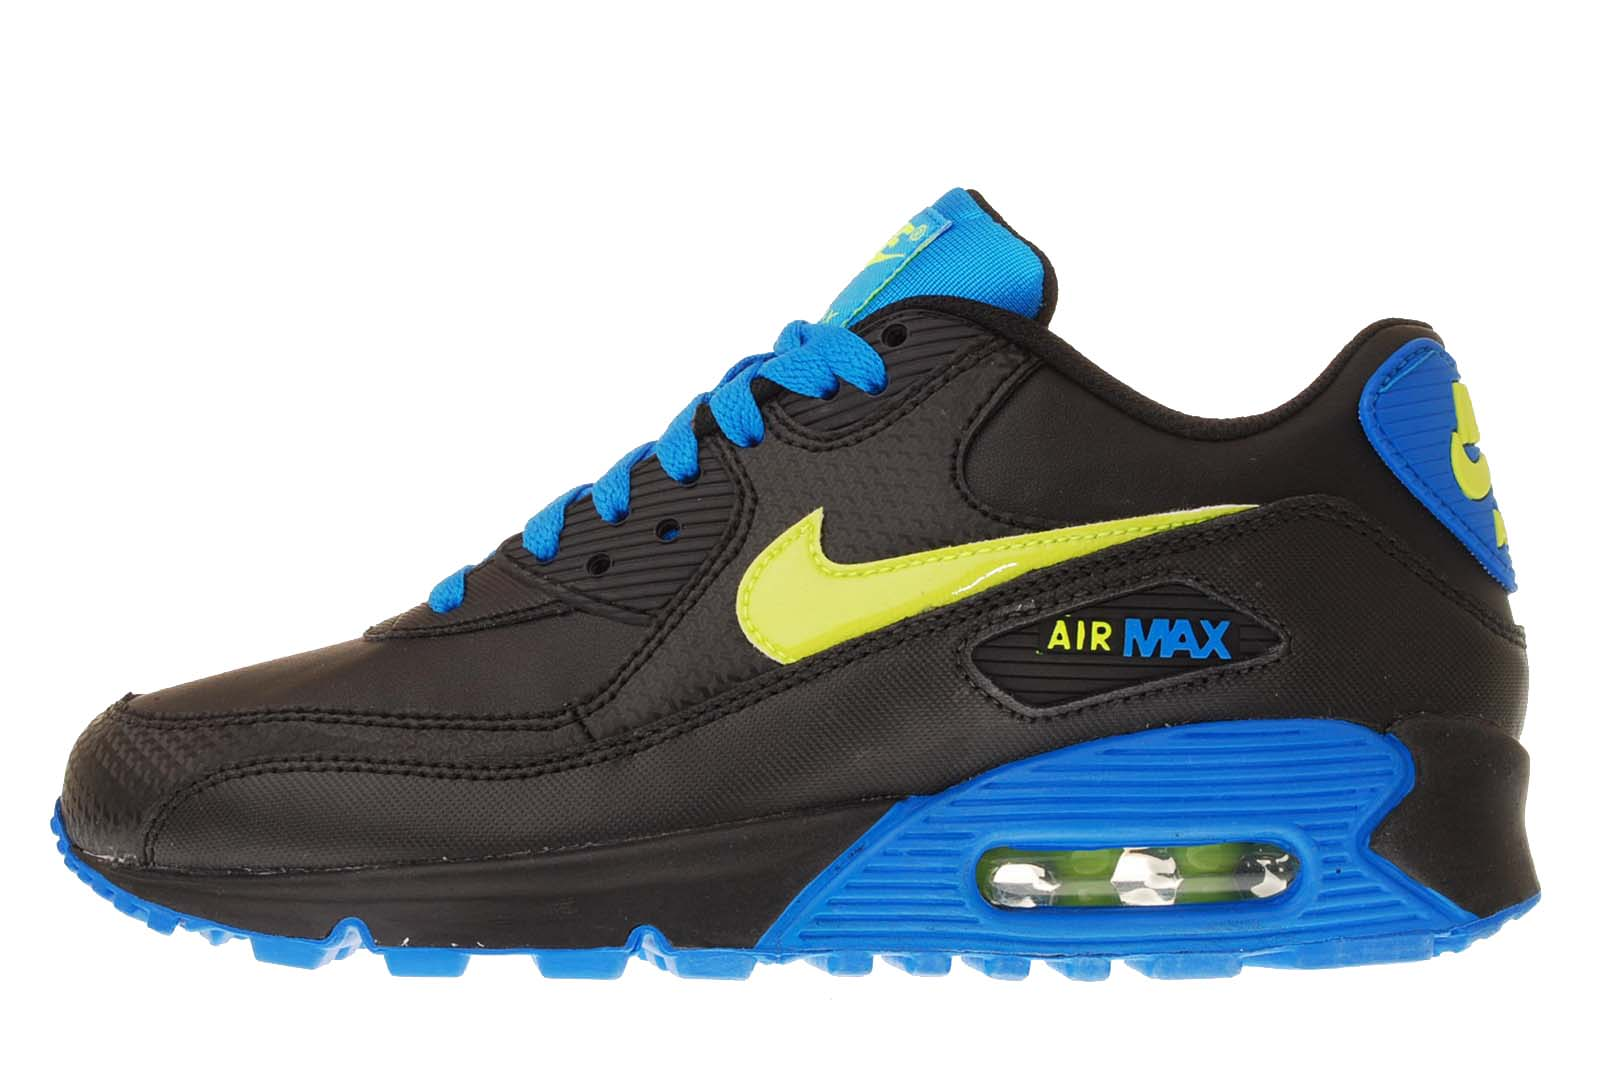 nike air max 90 gs black volt blue boys girls youth womens. Black Bedroom Furniture Sets. Home Design Ideas